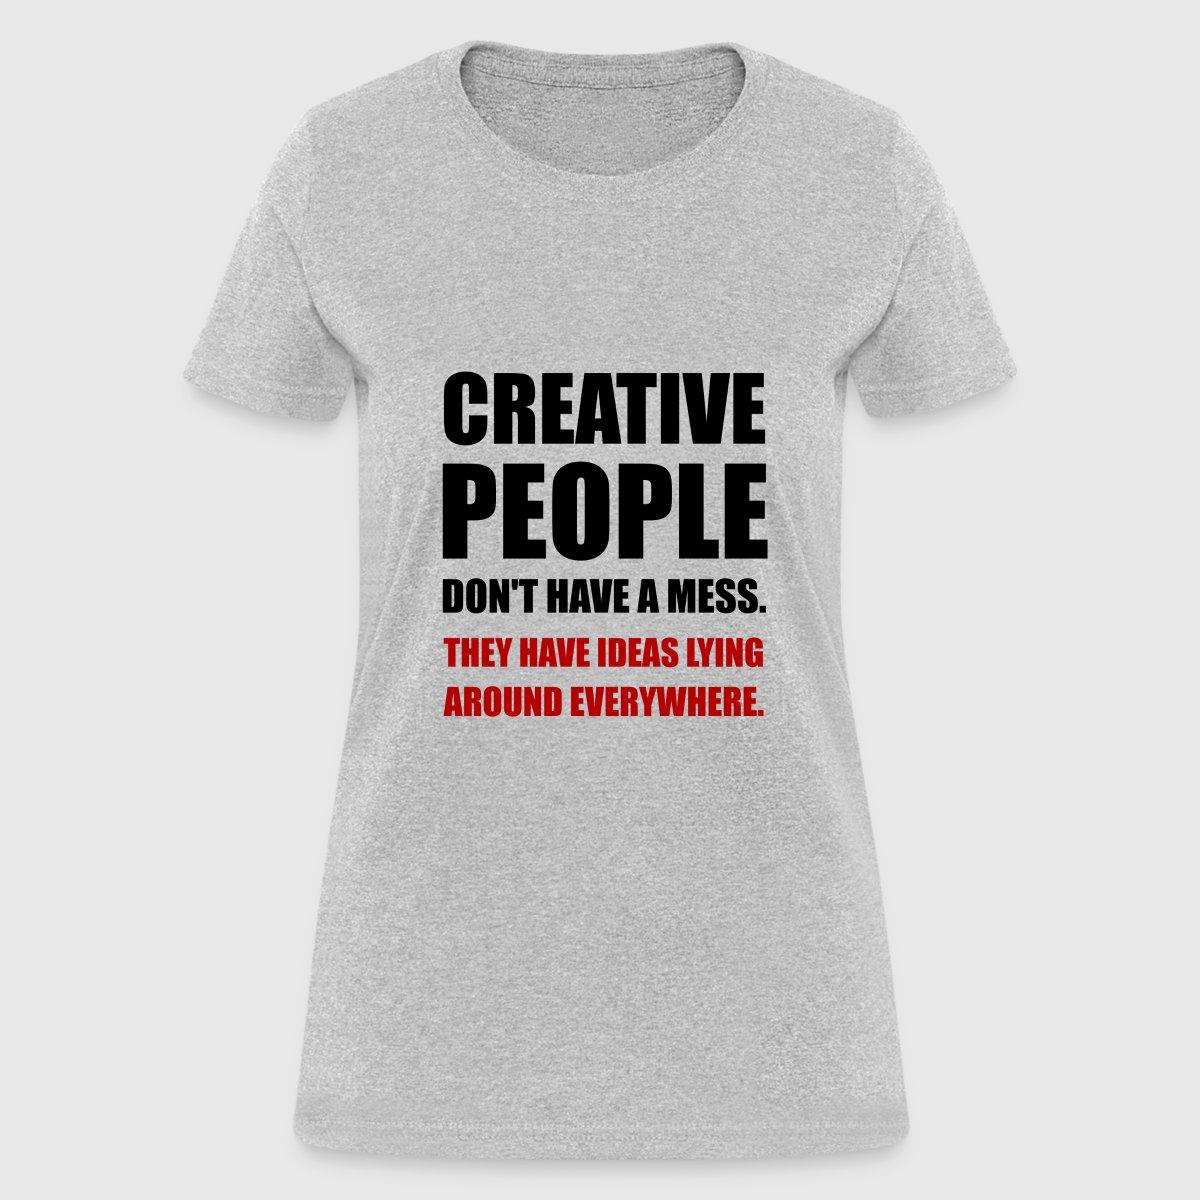 Softball Team Shirt Design Ideas | AGBU Hye Geen